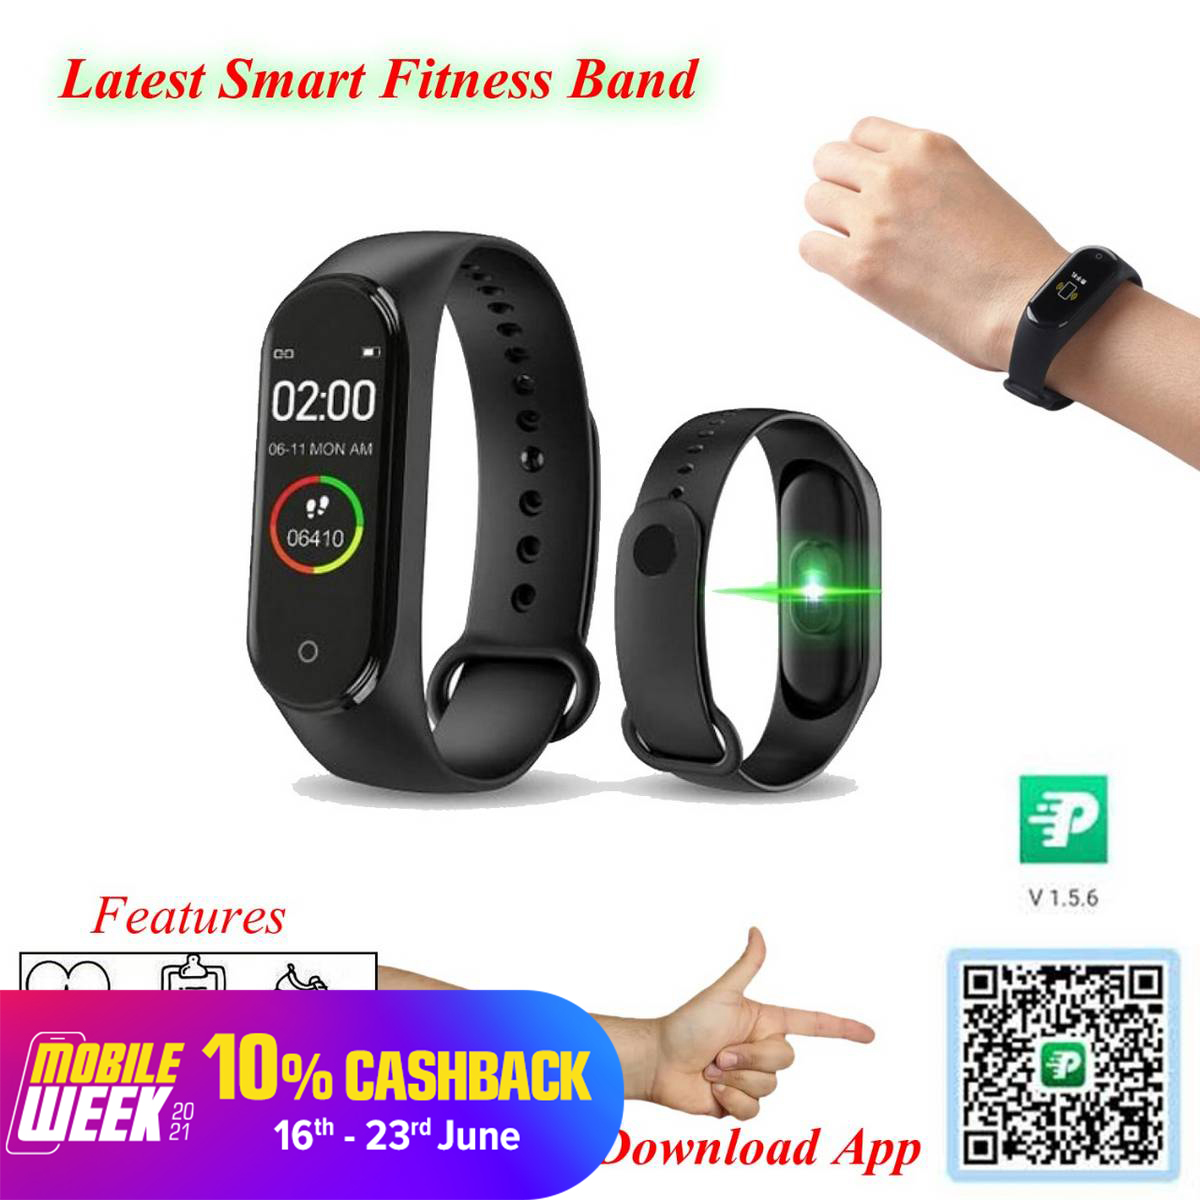 Latest M5 Smart Fitness Band (Black)